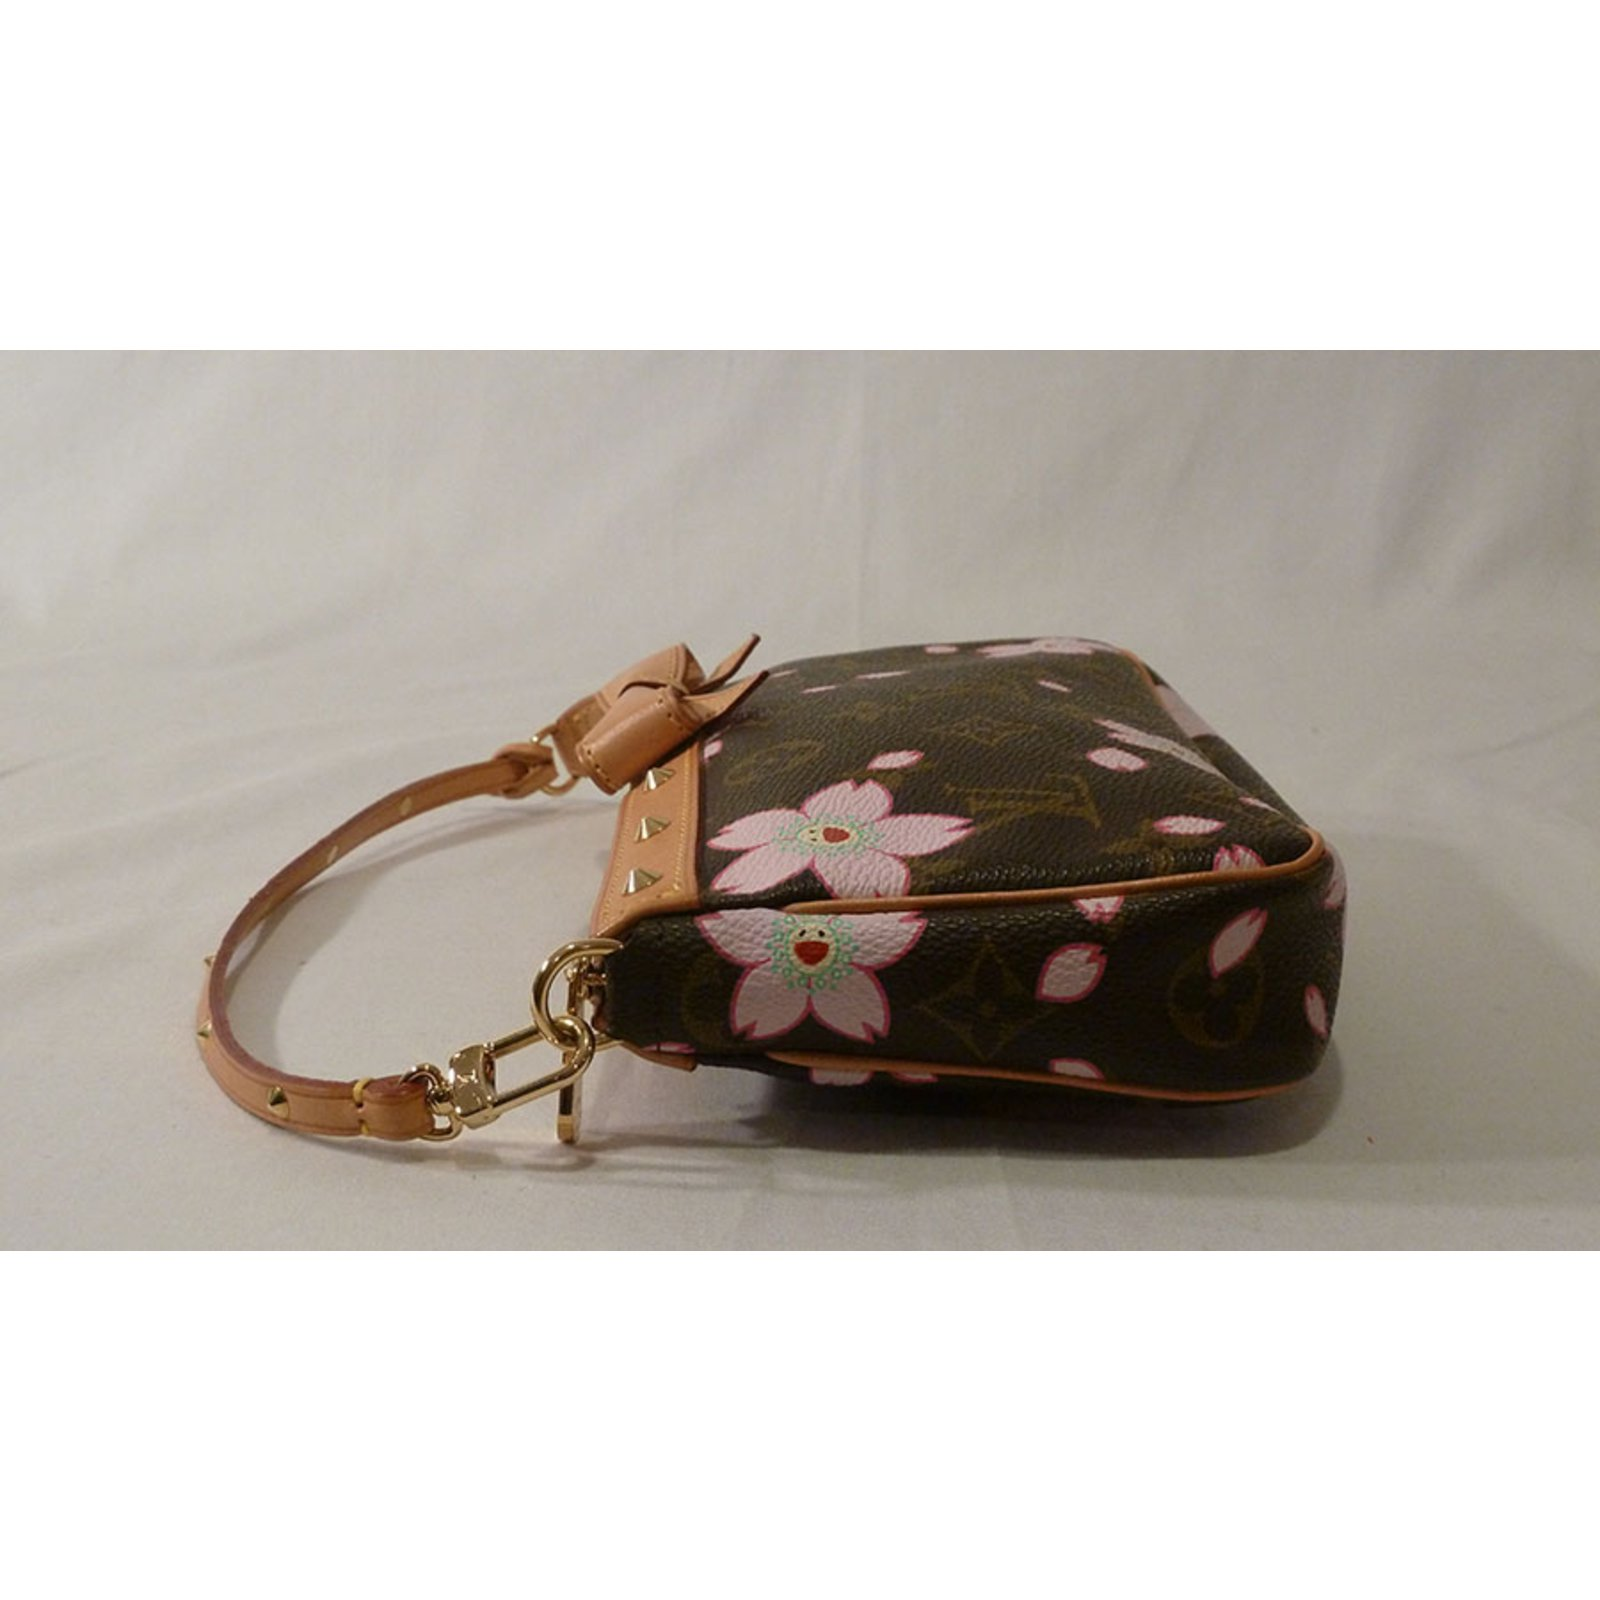 13f54c8113 Louis Vuitton Takashi Murakami Cherry Blossom Monogram Stud Pochette  Shoulder Bag Handbags Other Brown ref.37552 - Joli Closet